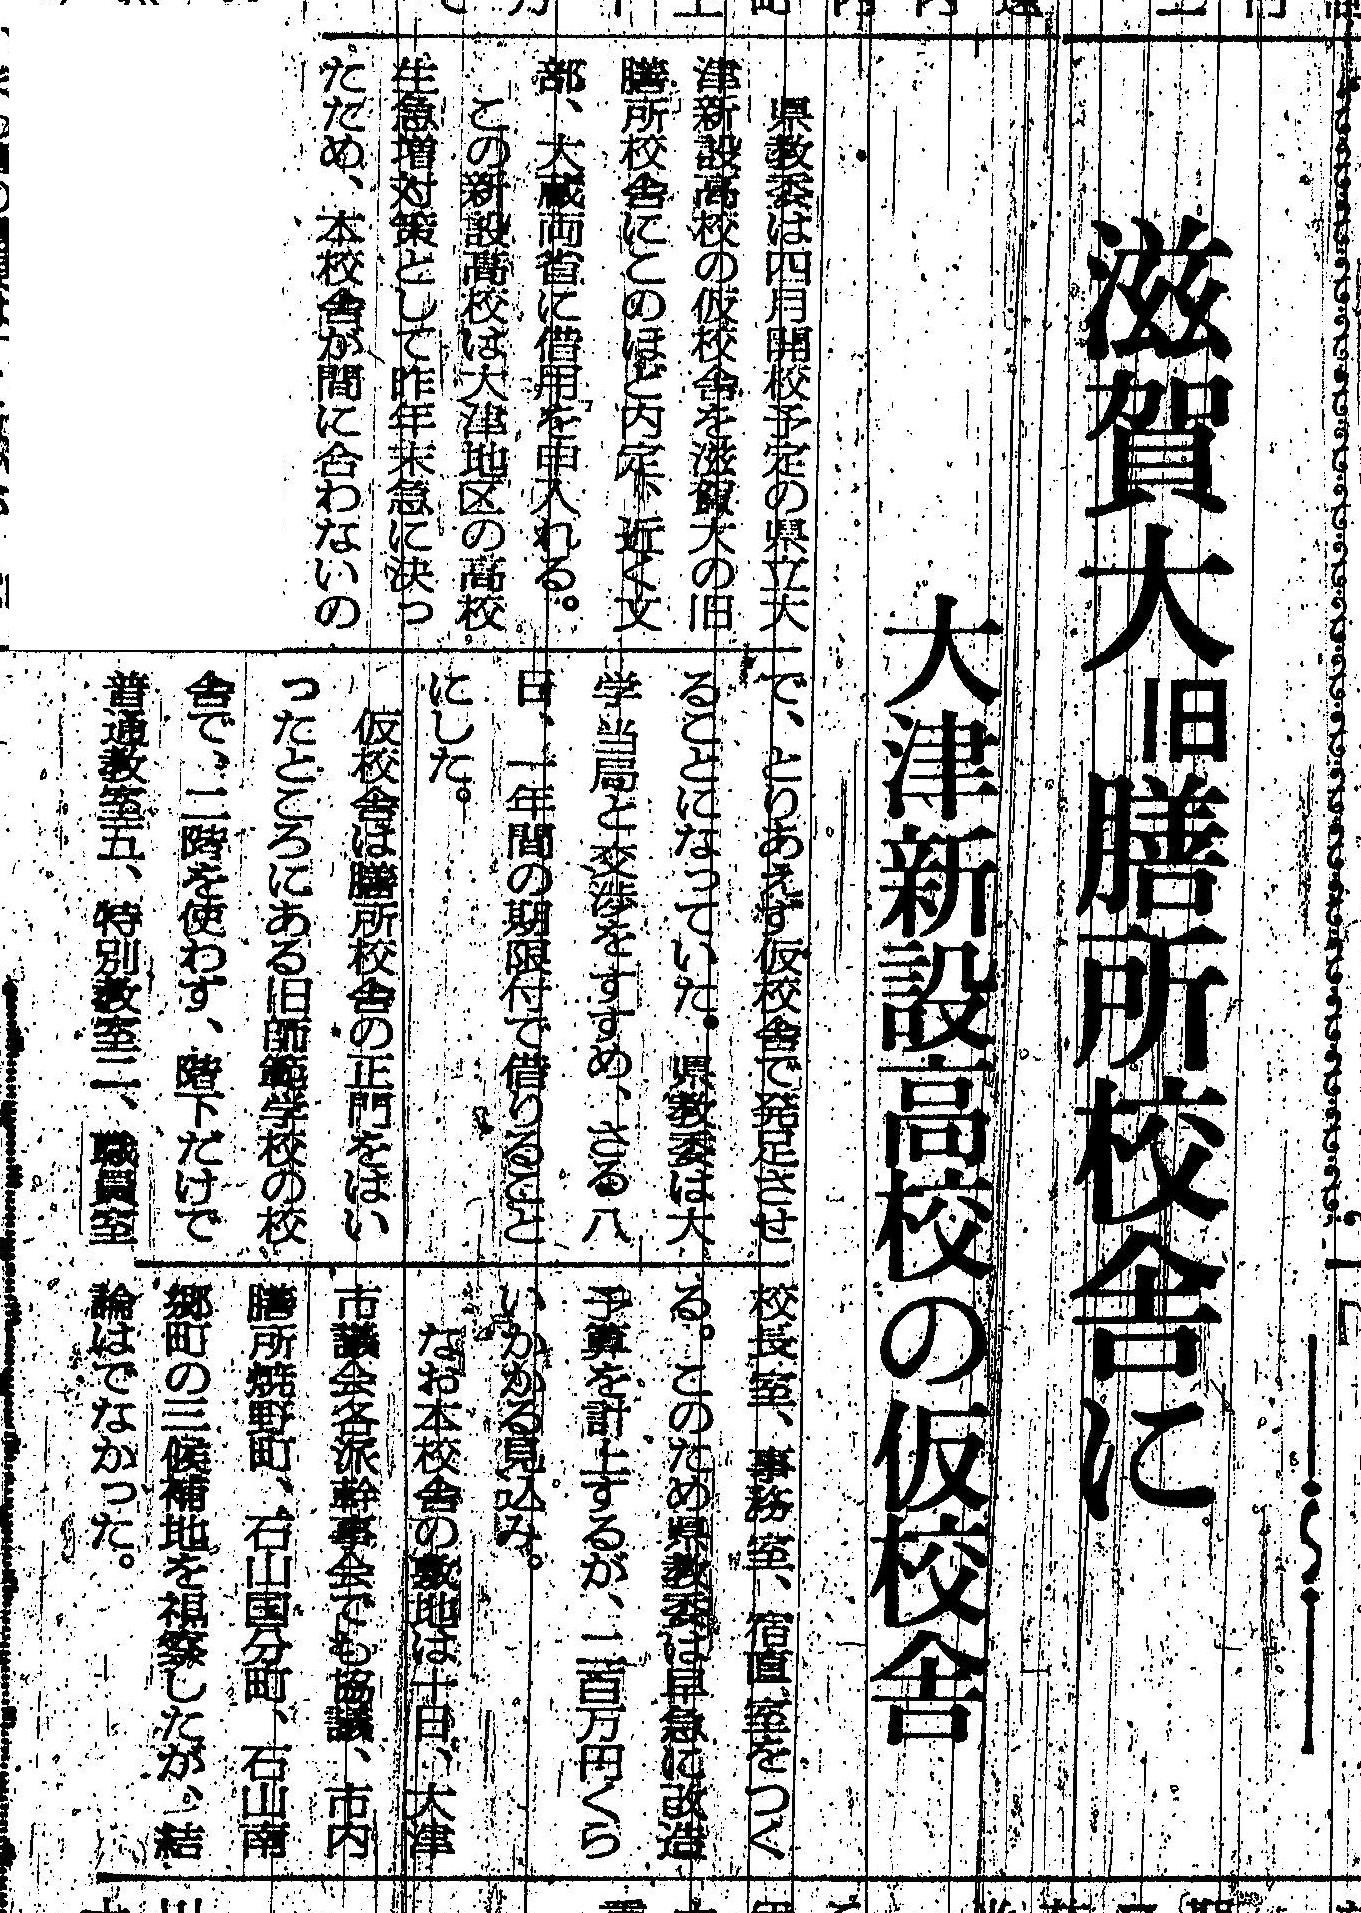 S38.1.11A 石高仮校舎 滋賀大旧校舎にb